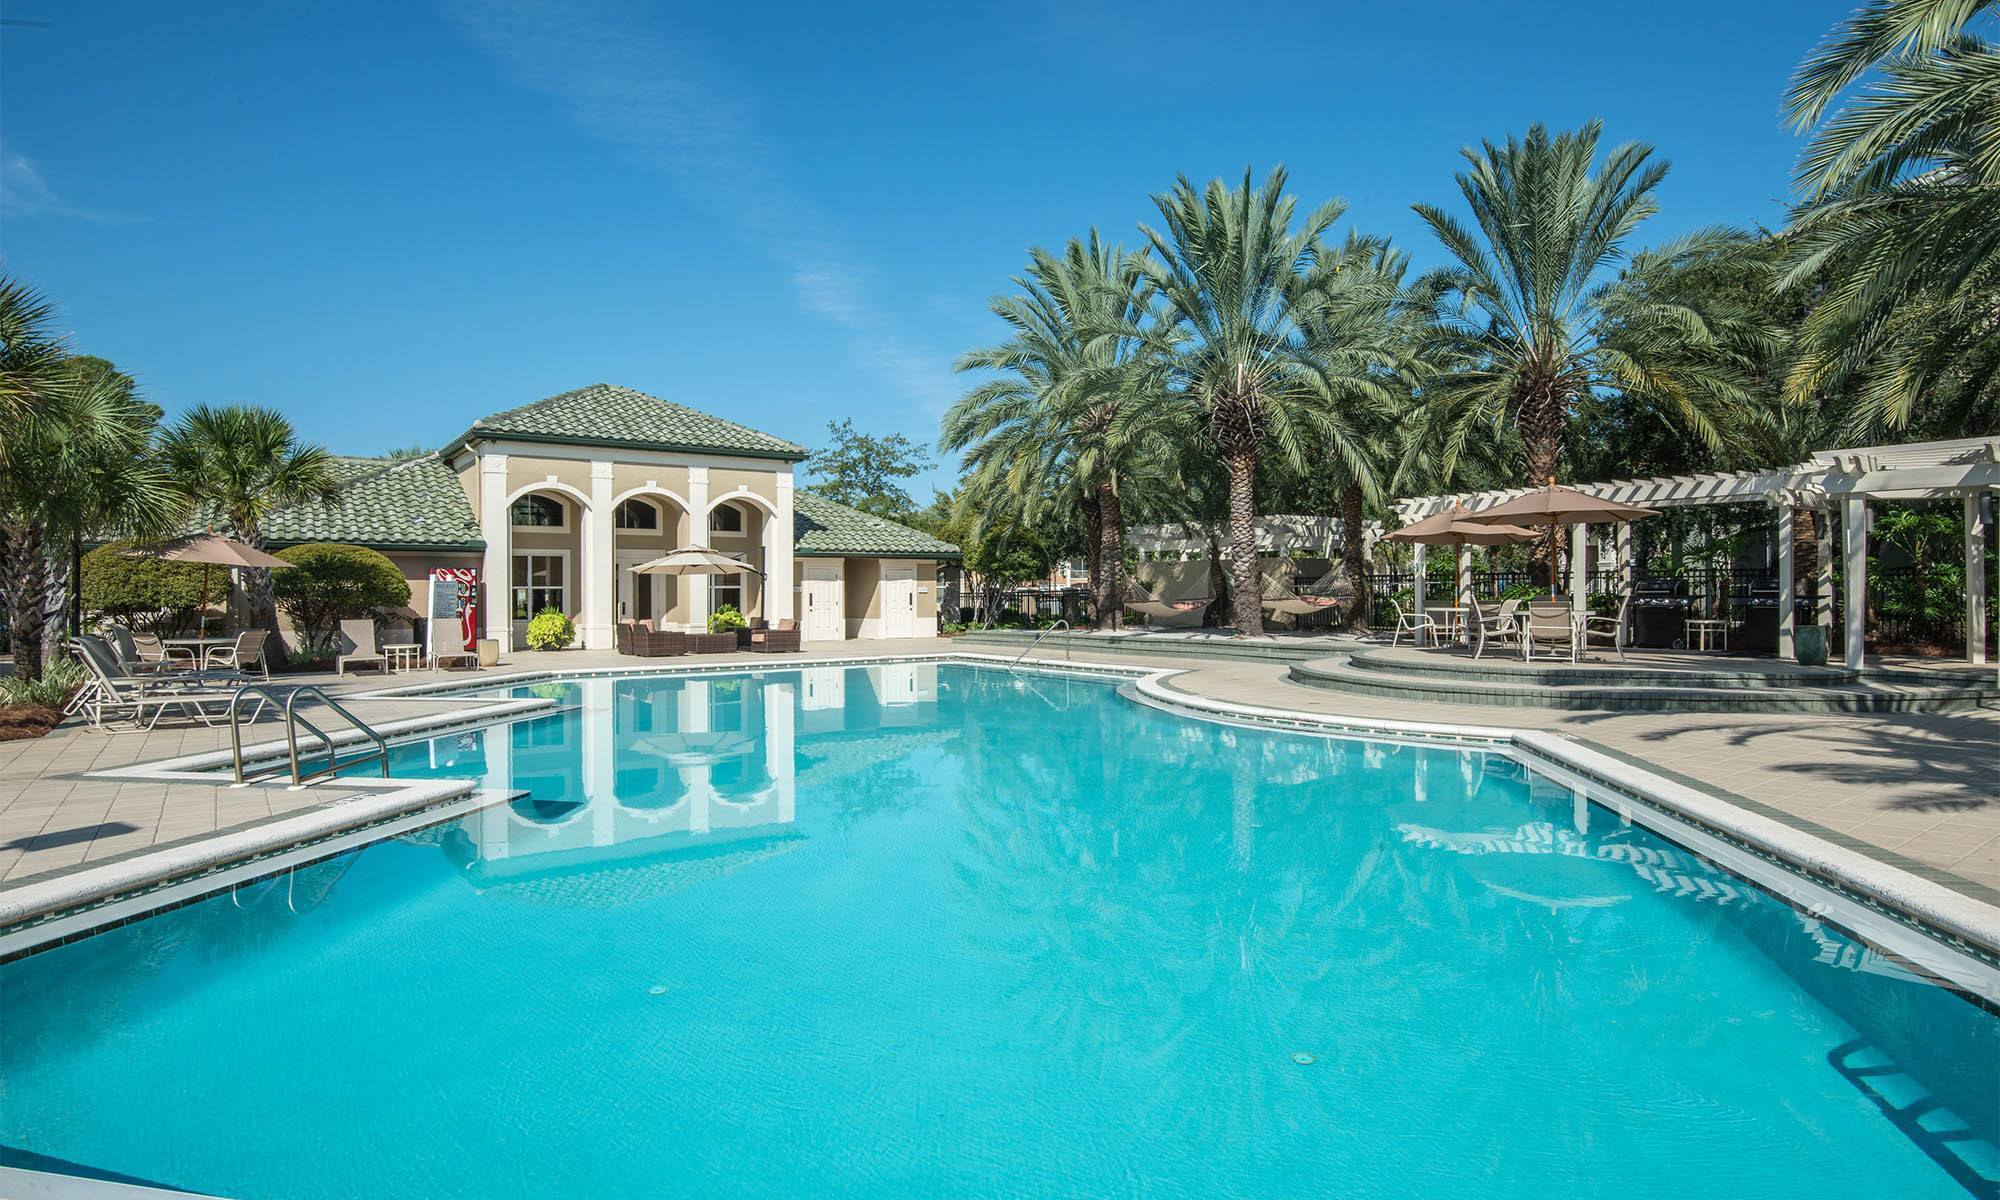 Apartments in Destin, FL